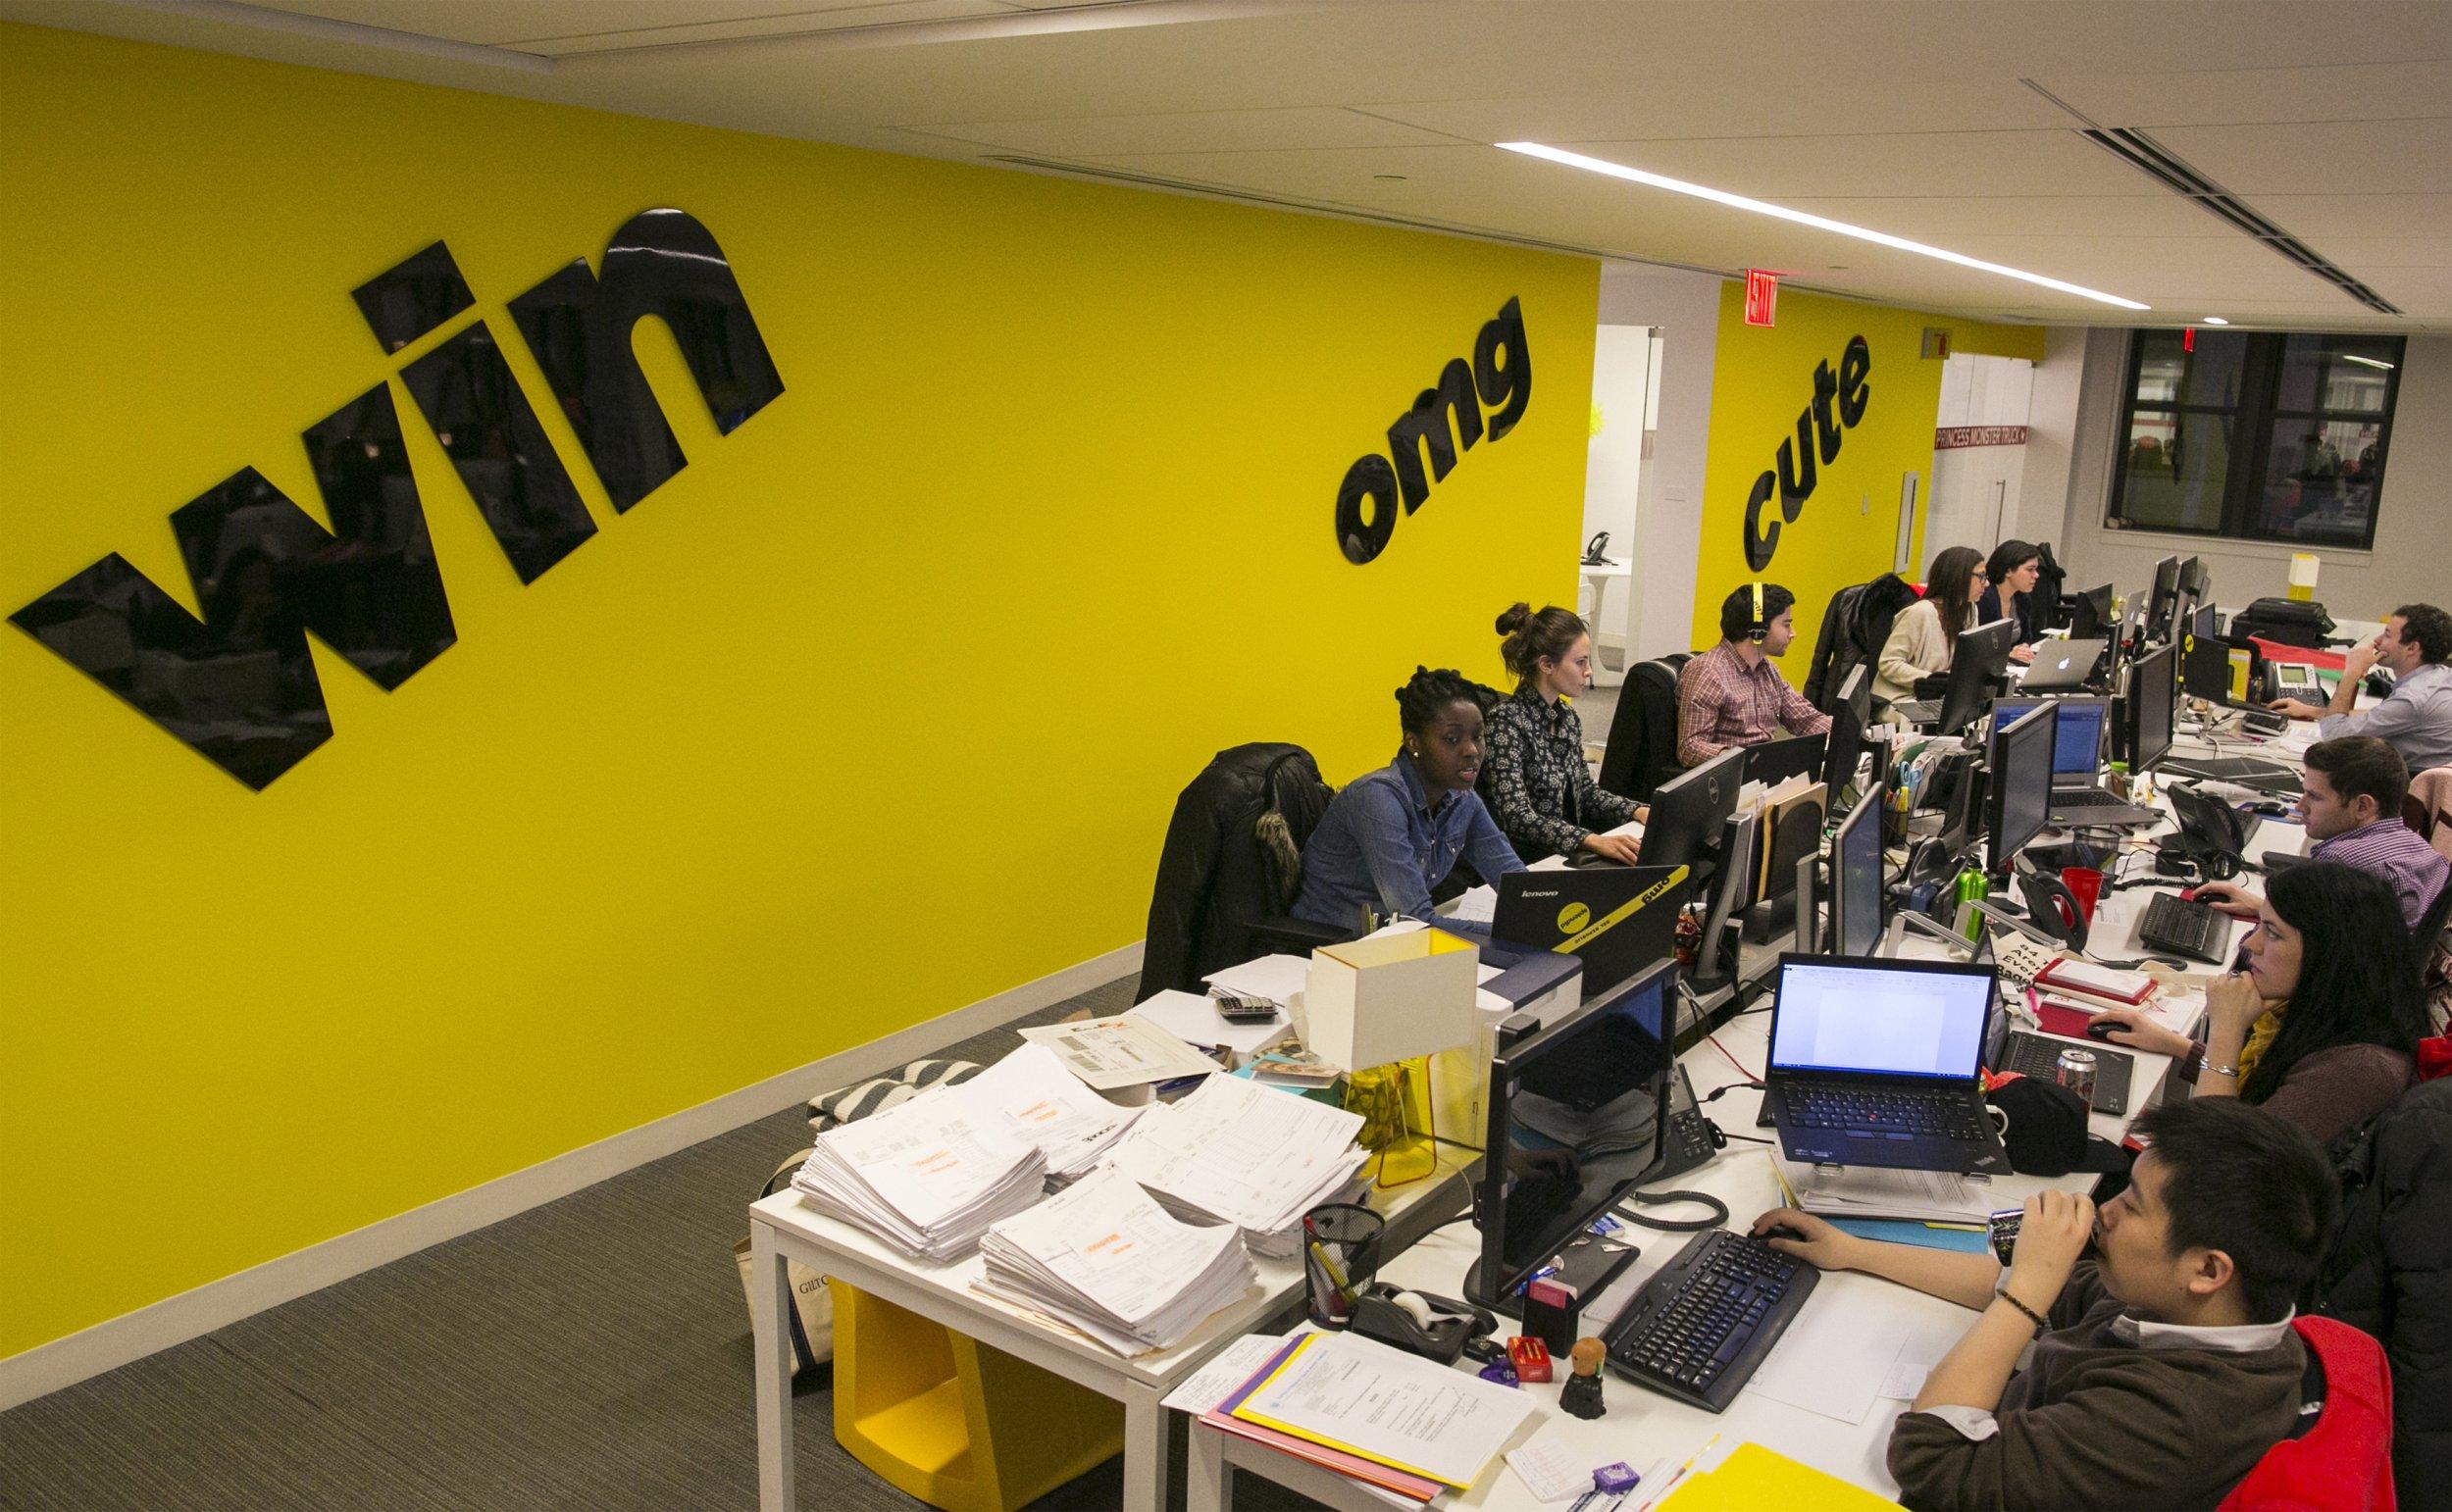 BuzzFeed's headquarters in New York.